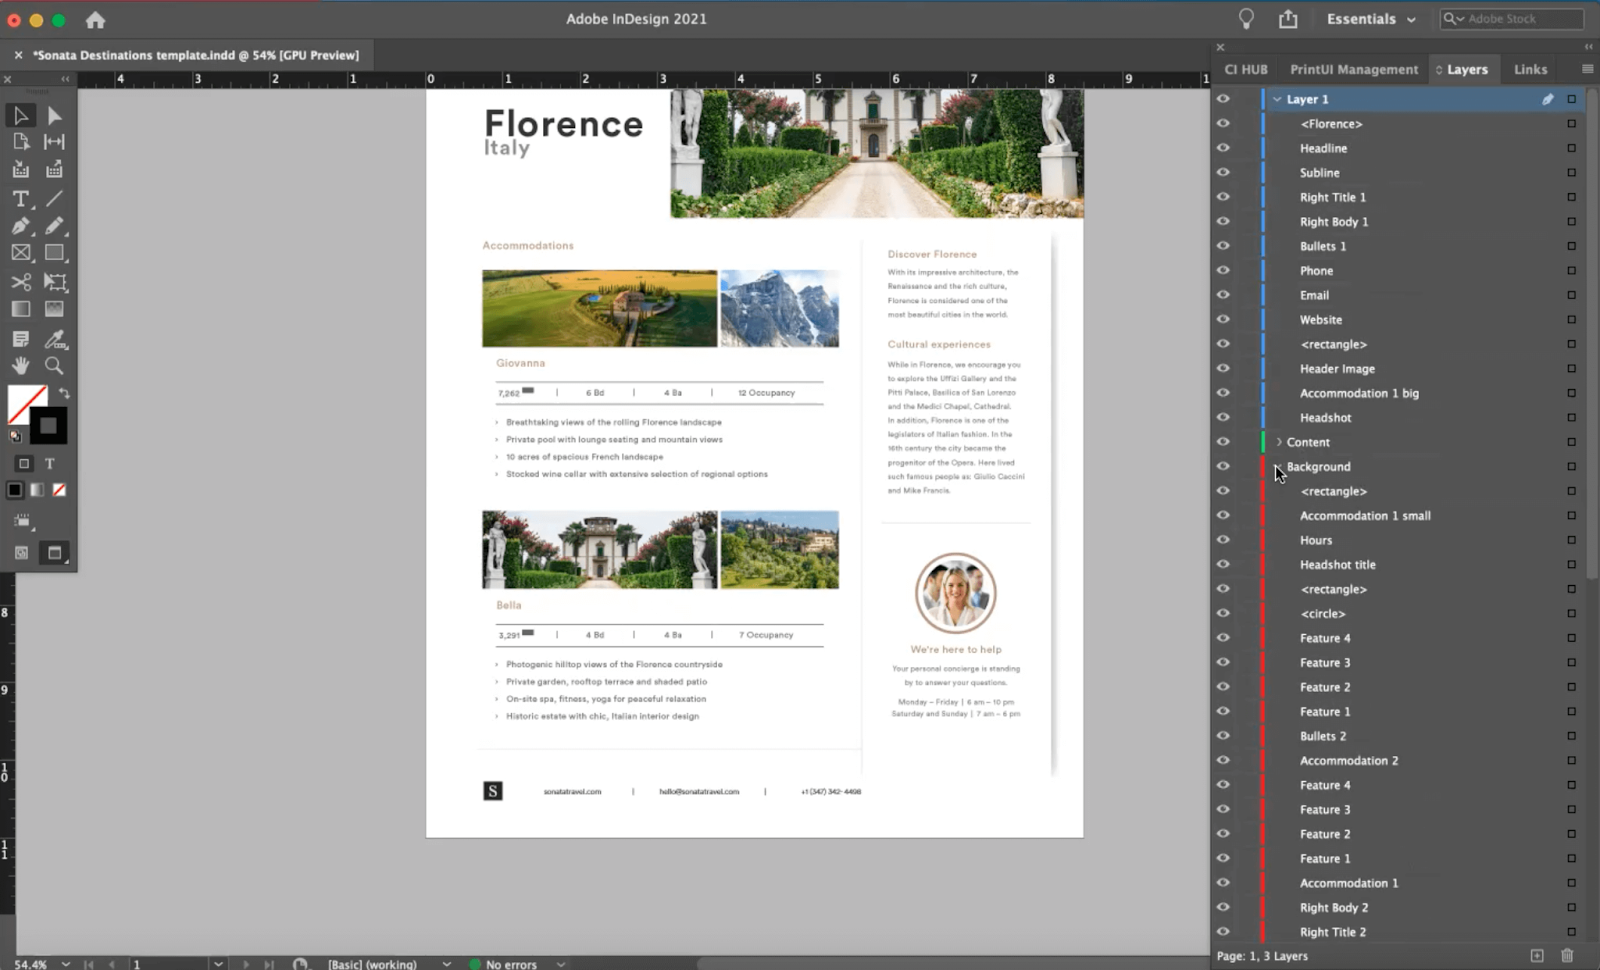 Locking template design elements in Brandfolder